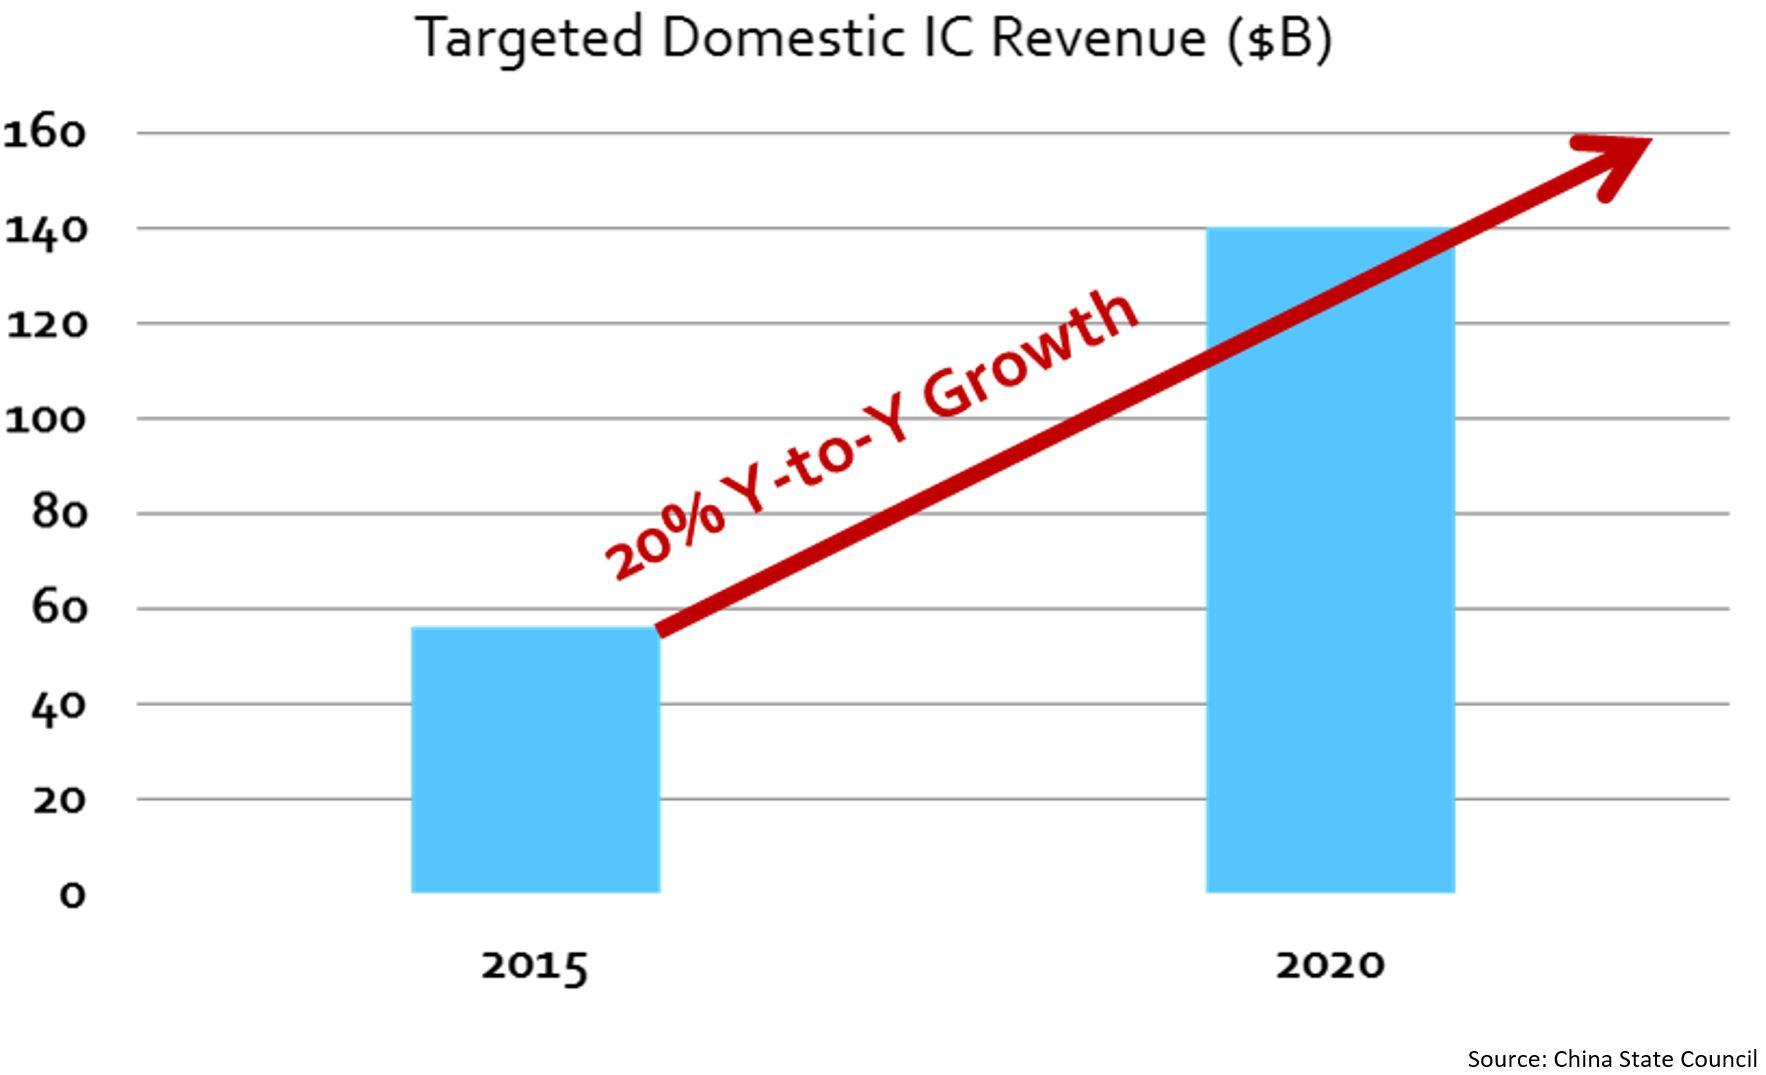 EDA Consortium Illustration #1_Target IC Revenue Growth Chart